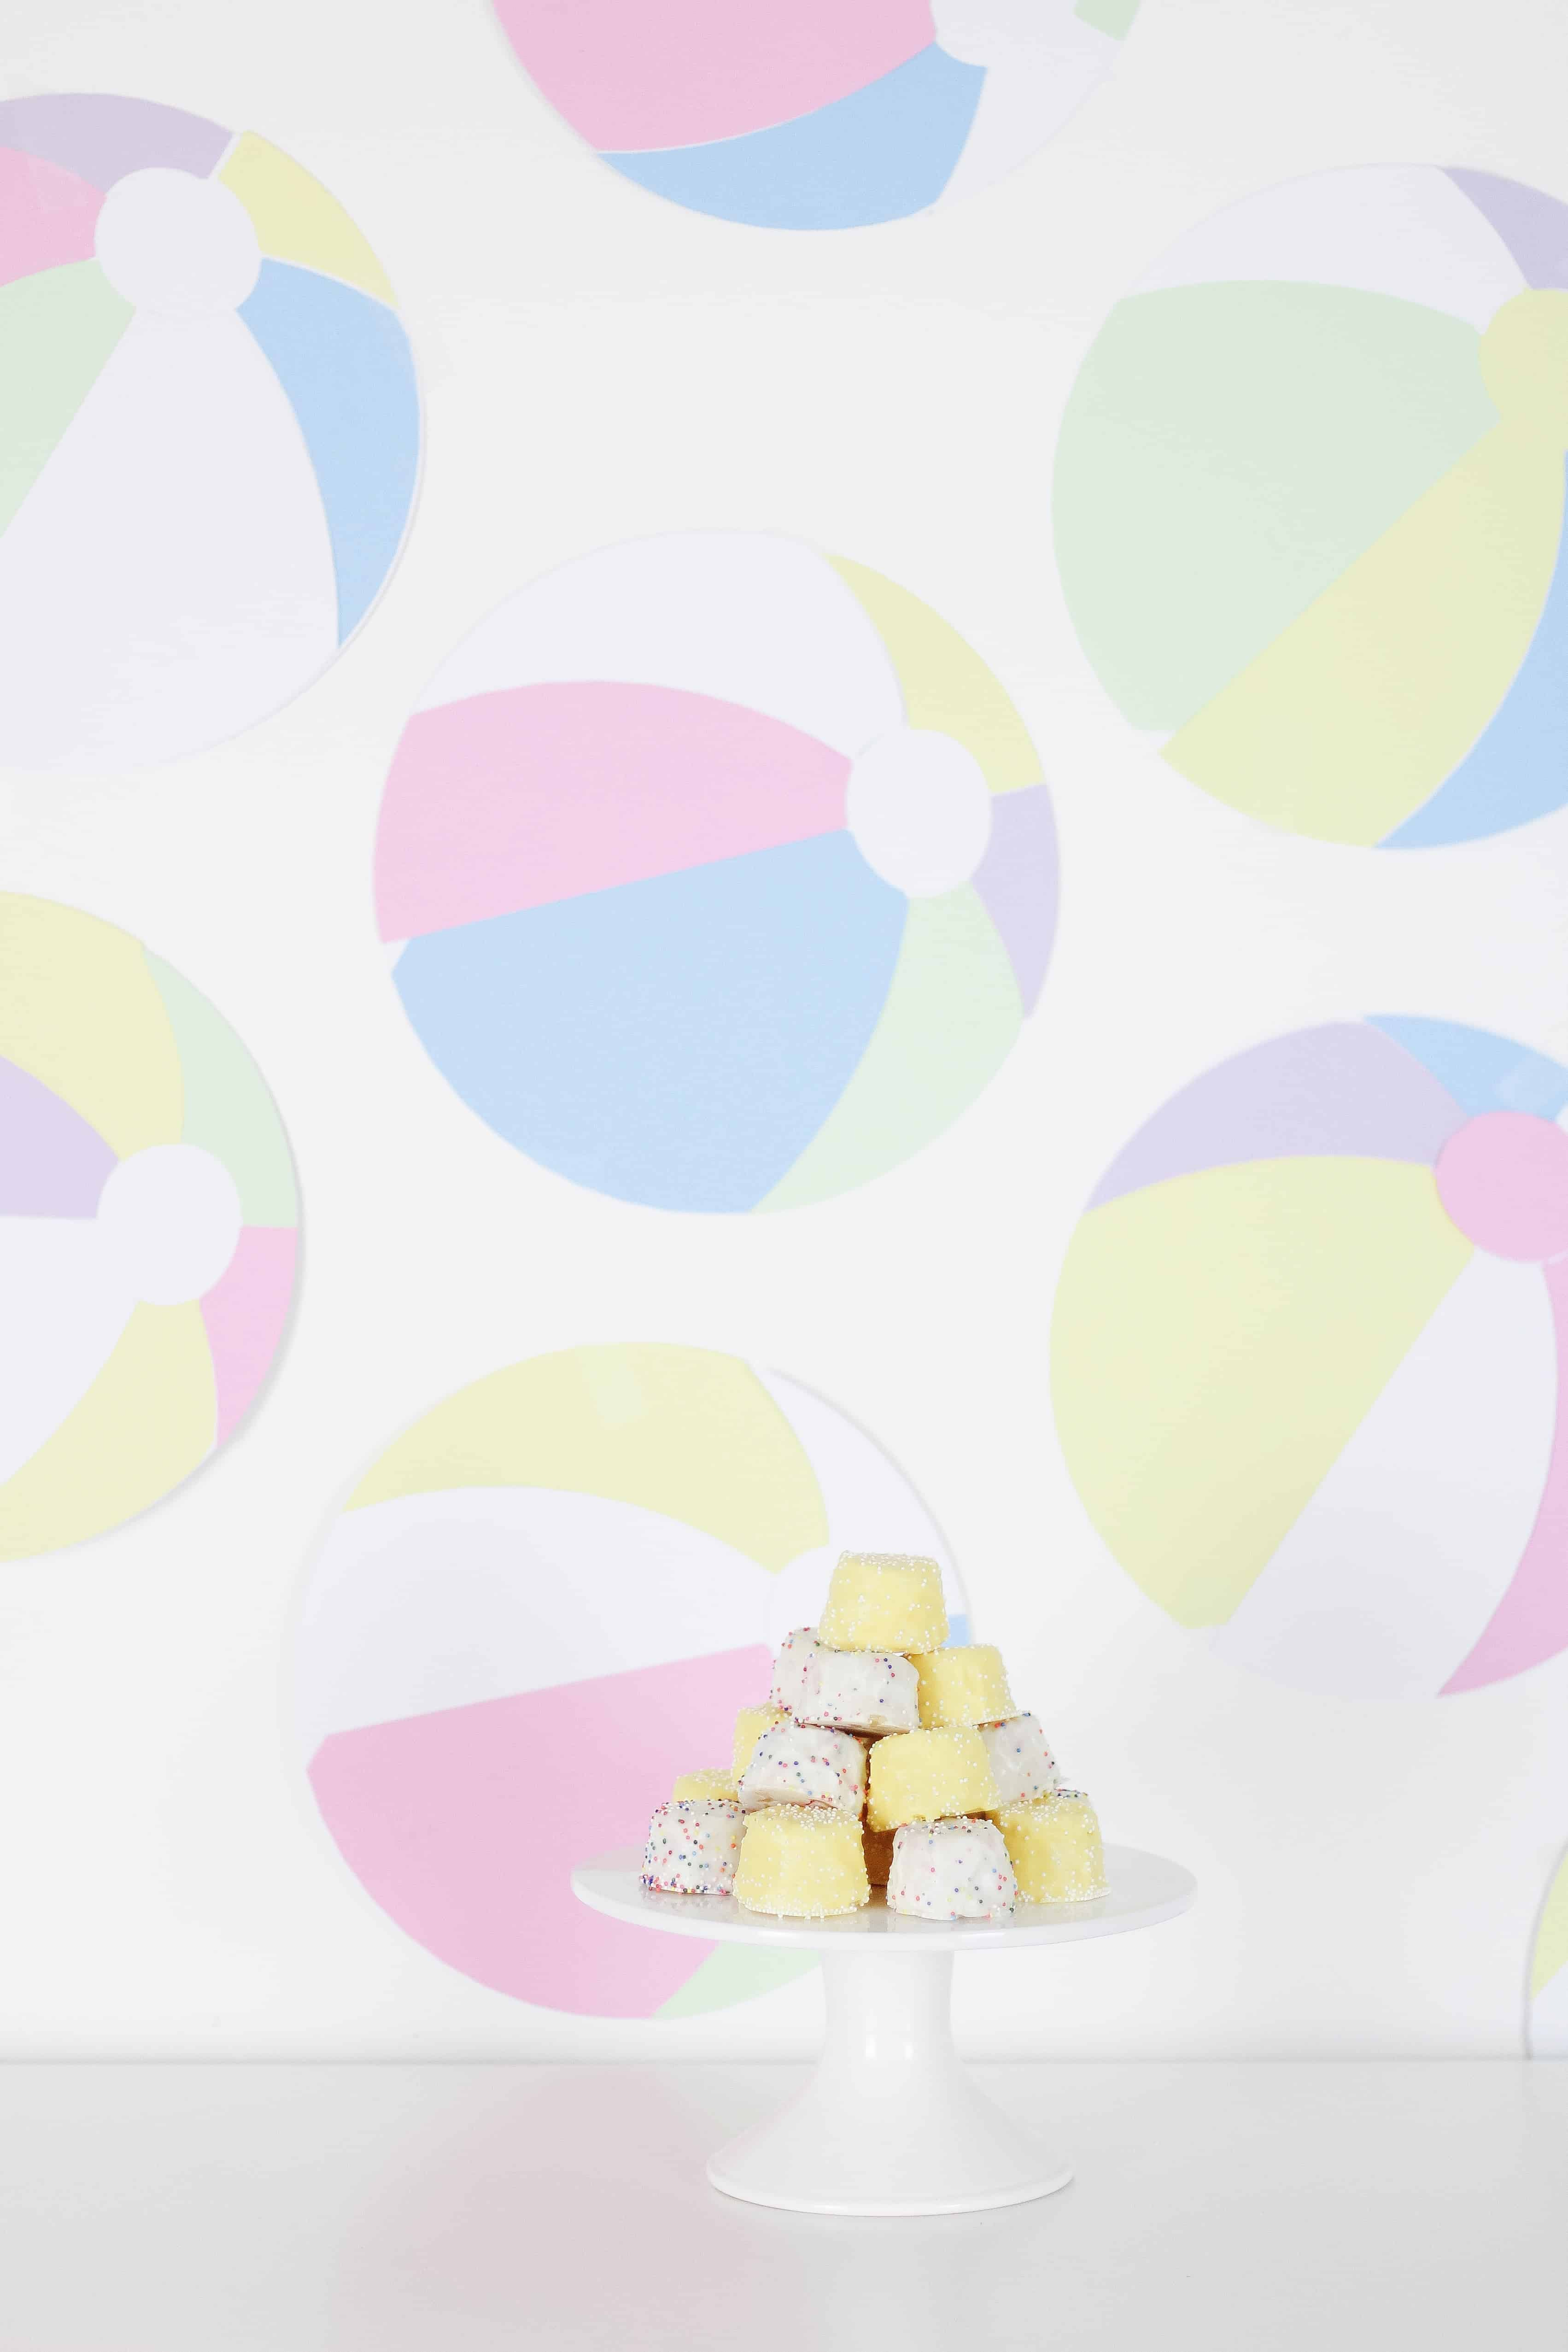 Beach Ball Wall with cake